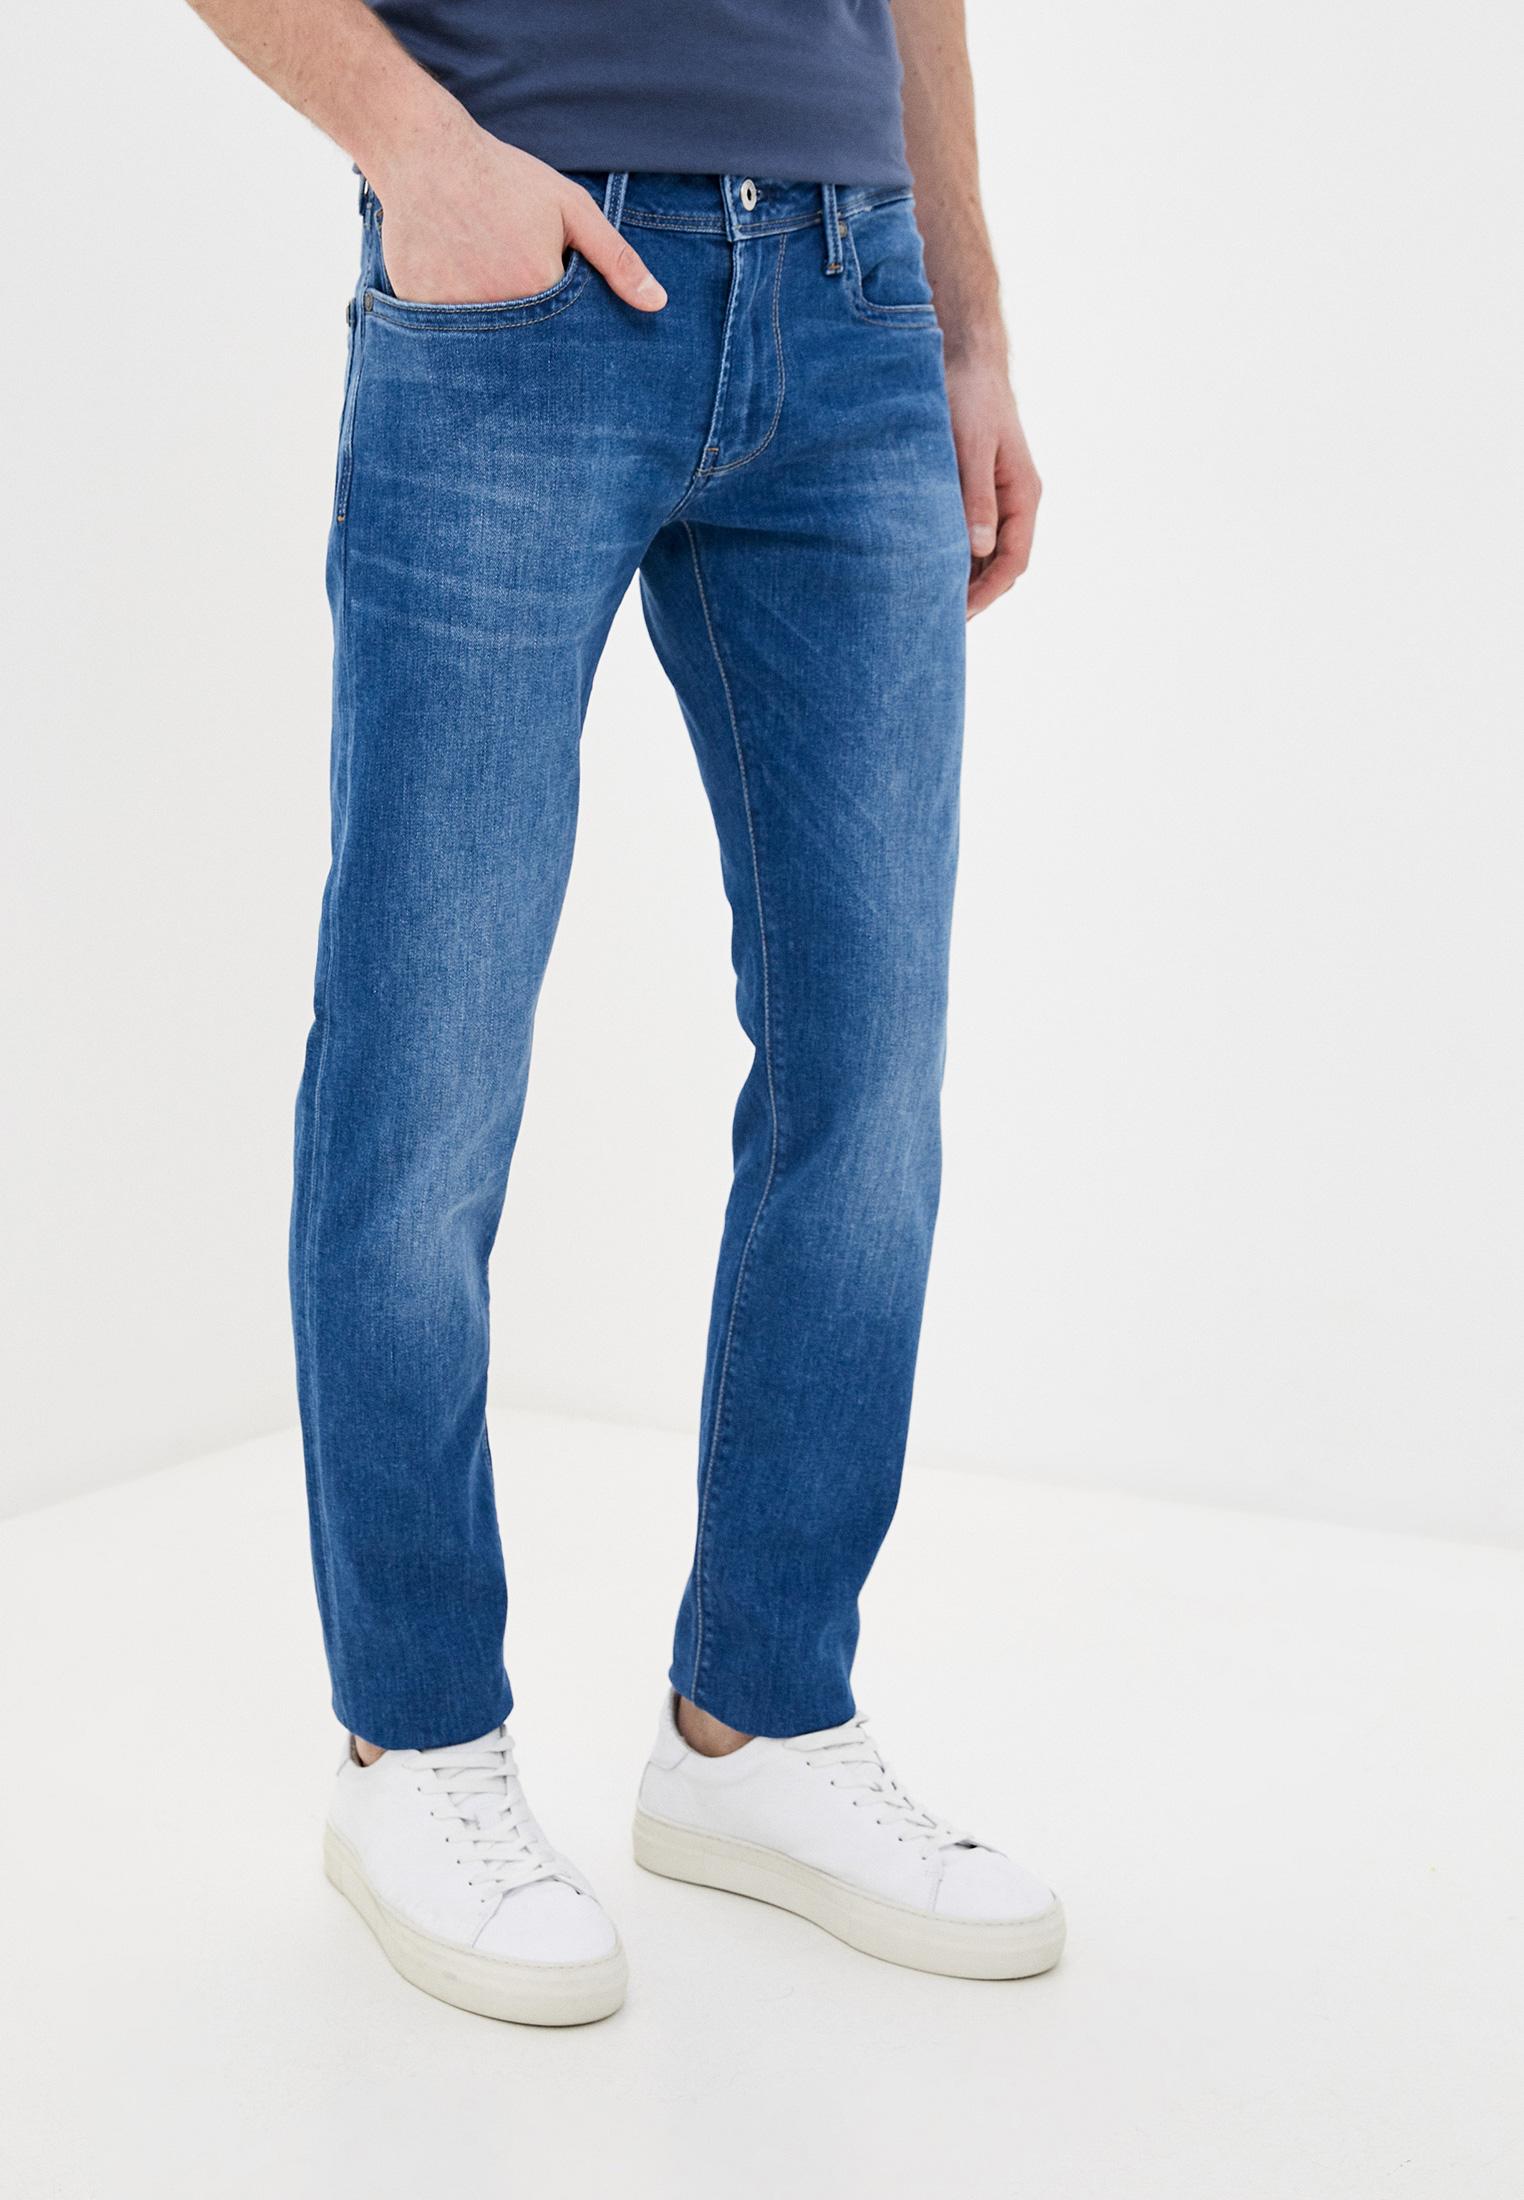 Джинсы Pepe Jeans HATCH за 4 010 ₽. в интернет-магазине Lamoda.ru